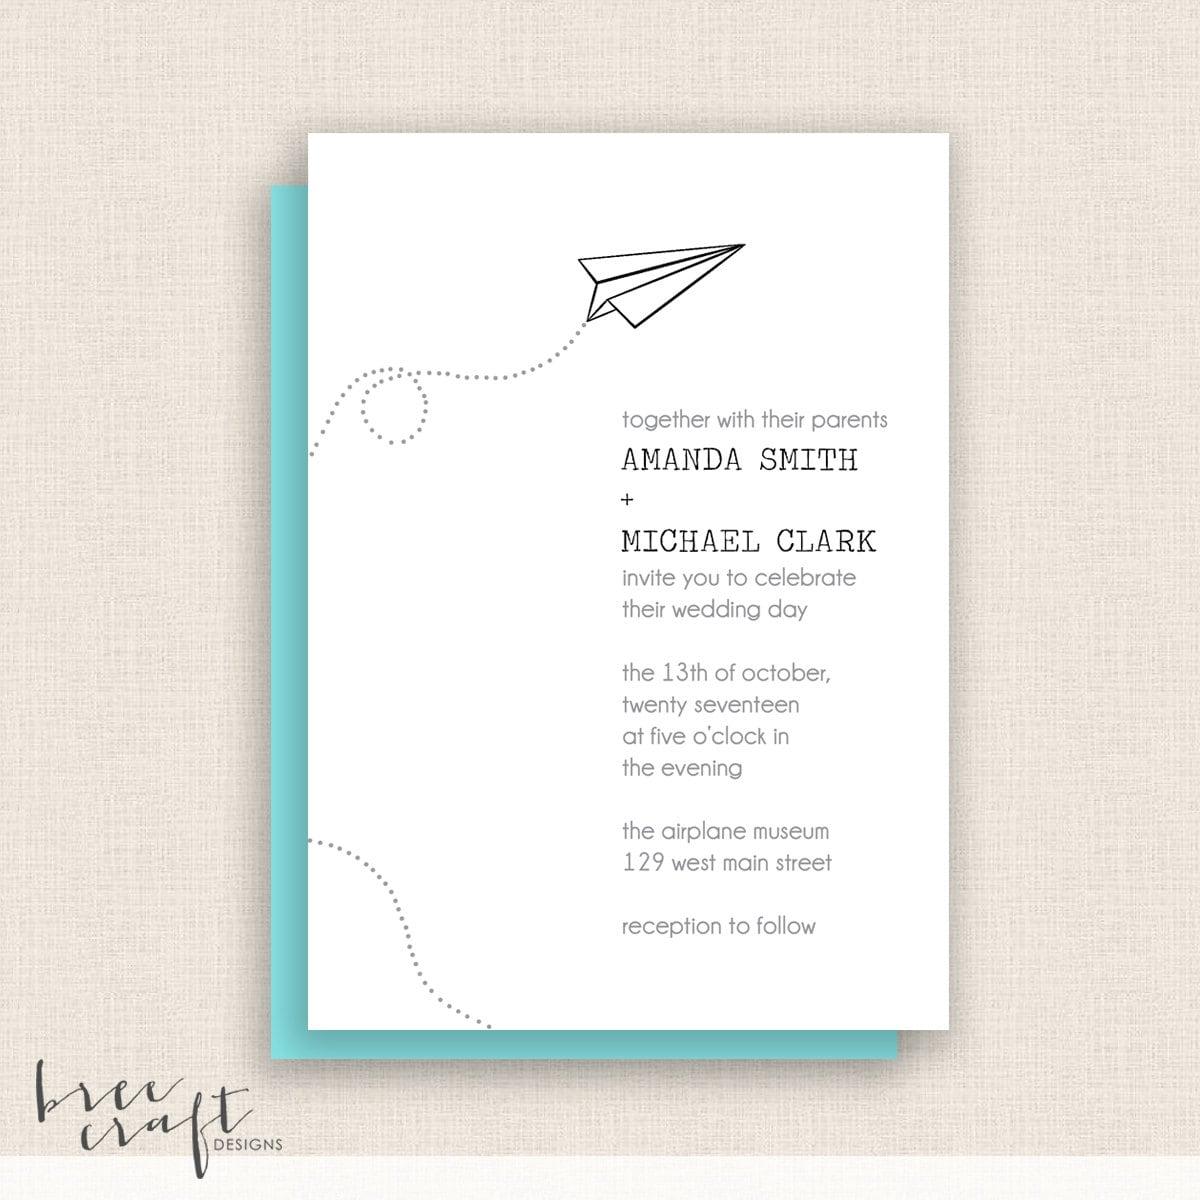 Airplane Birthday Invitation Diy Printable By Vindee On Etsy: PAPER AIRPLANE DIY Printable Wedding Invitation